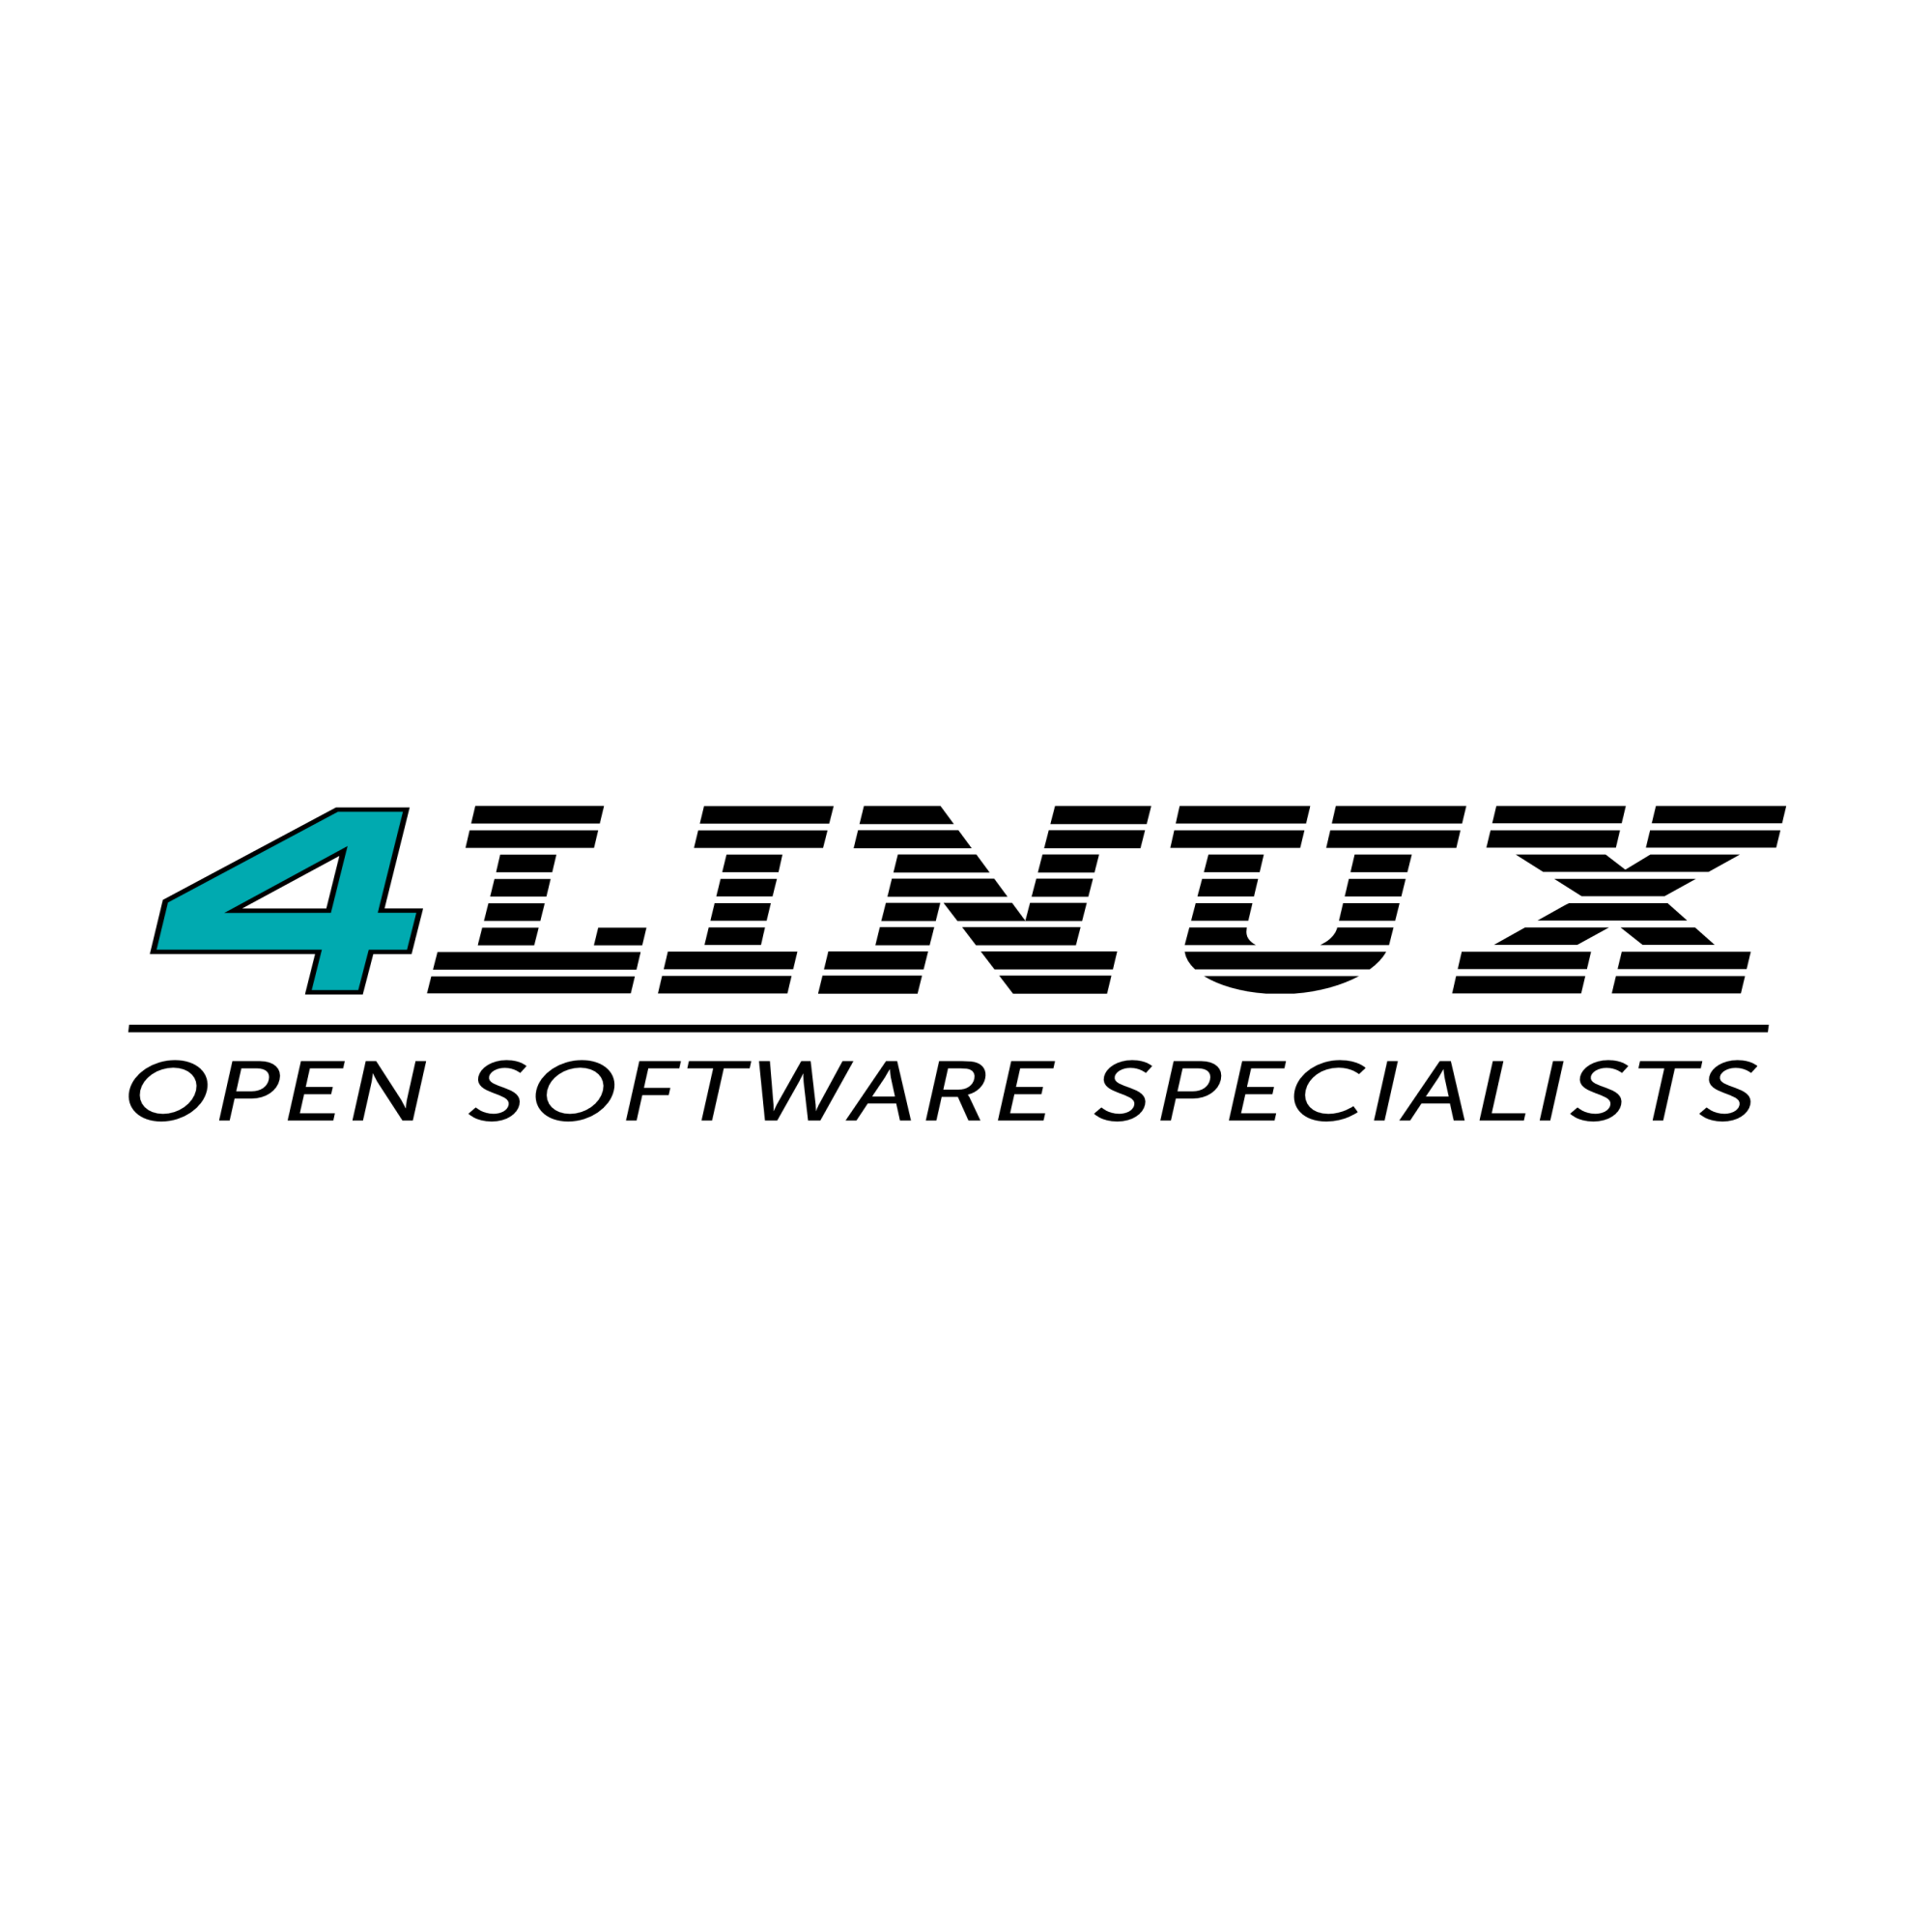 4Linux